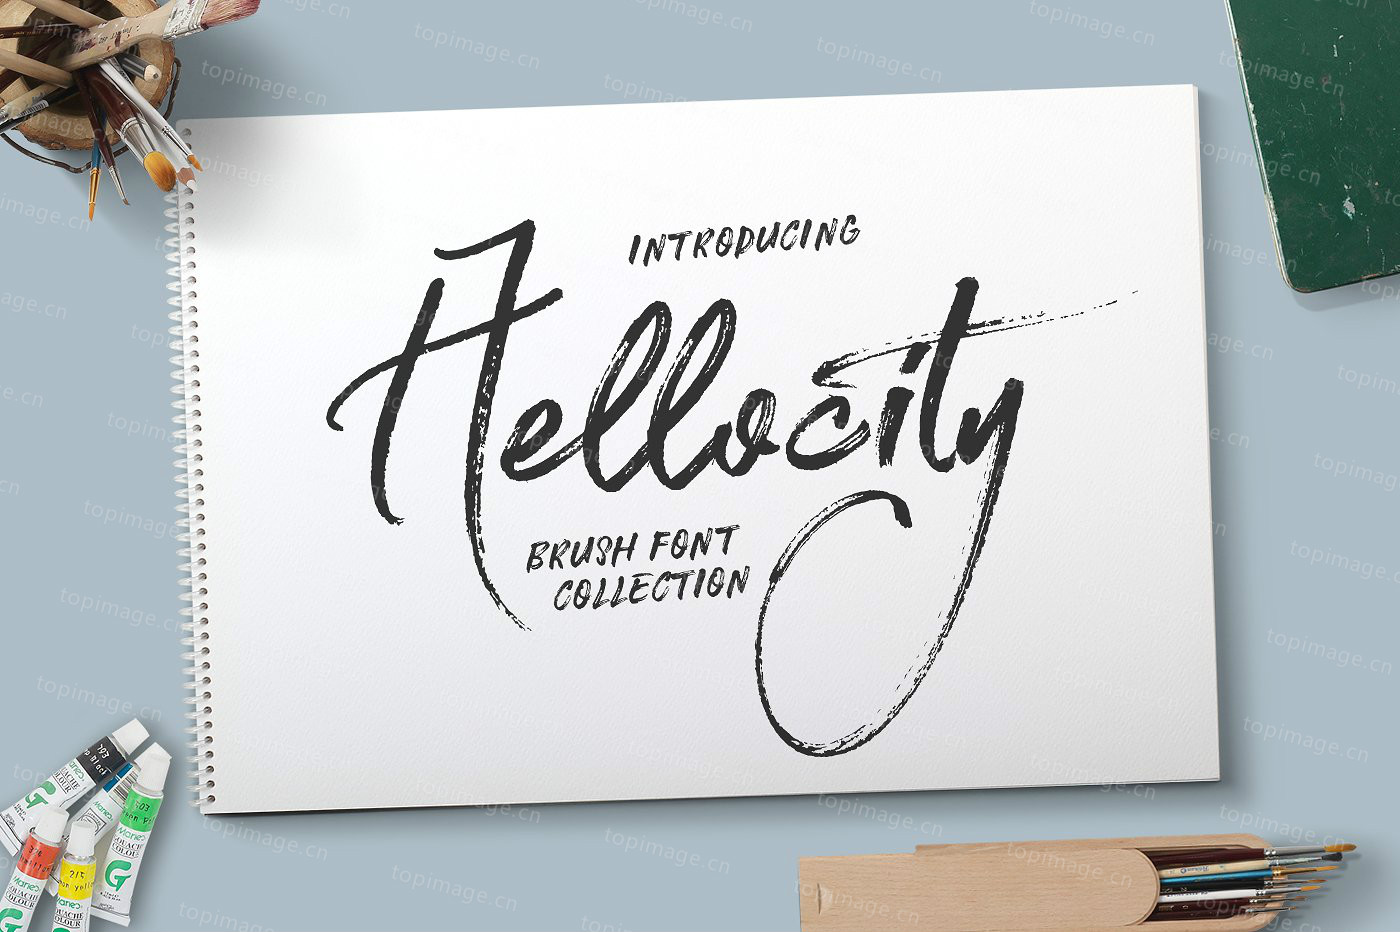 Hellocity毛笔手写书法飘逸好看的签名英文字体下载